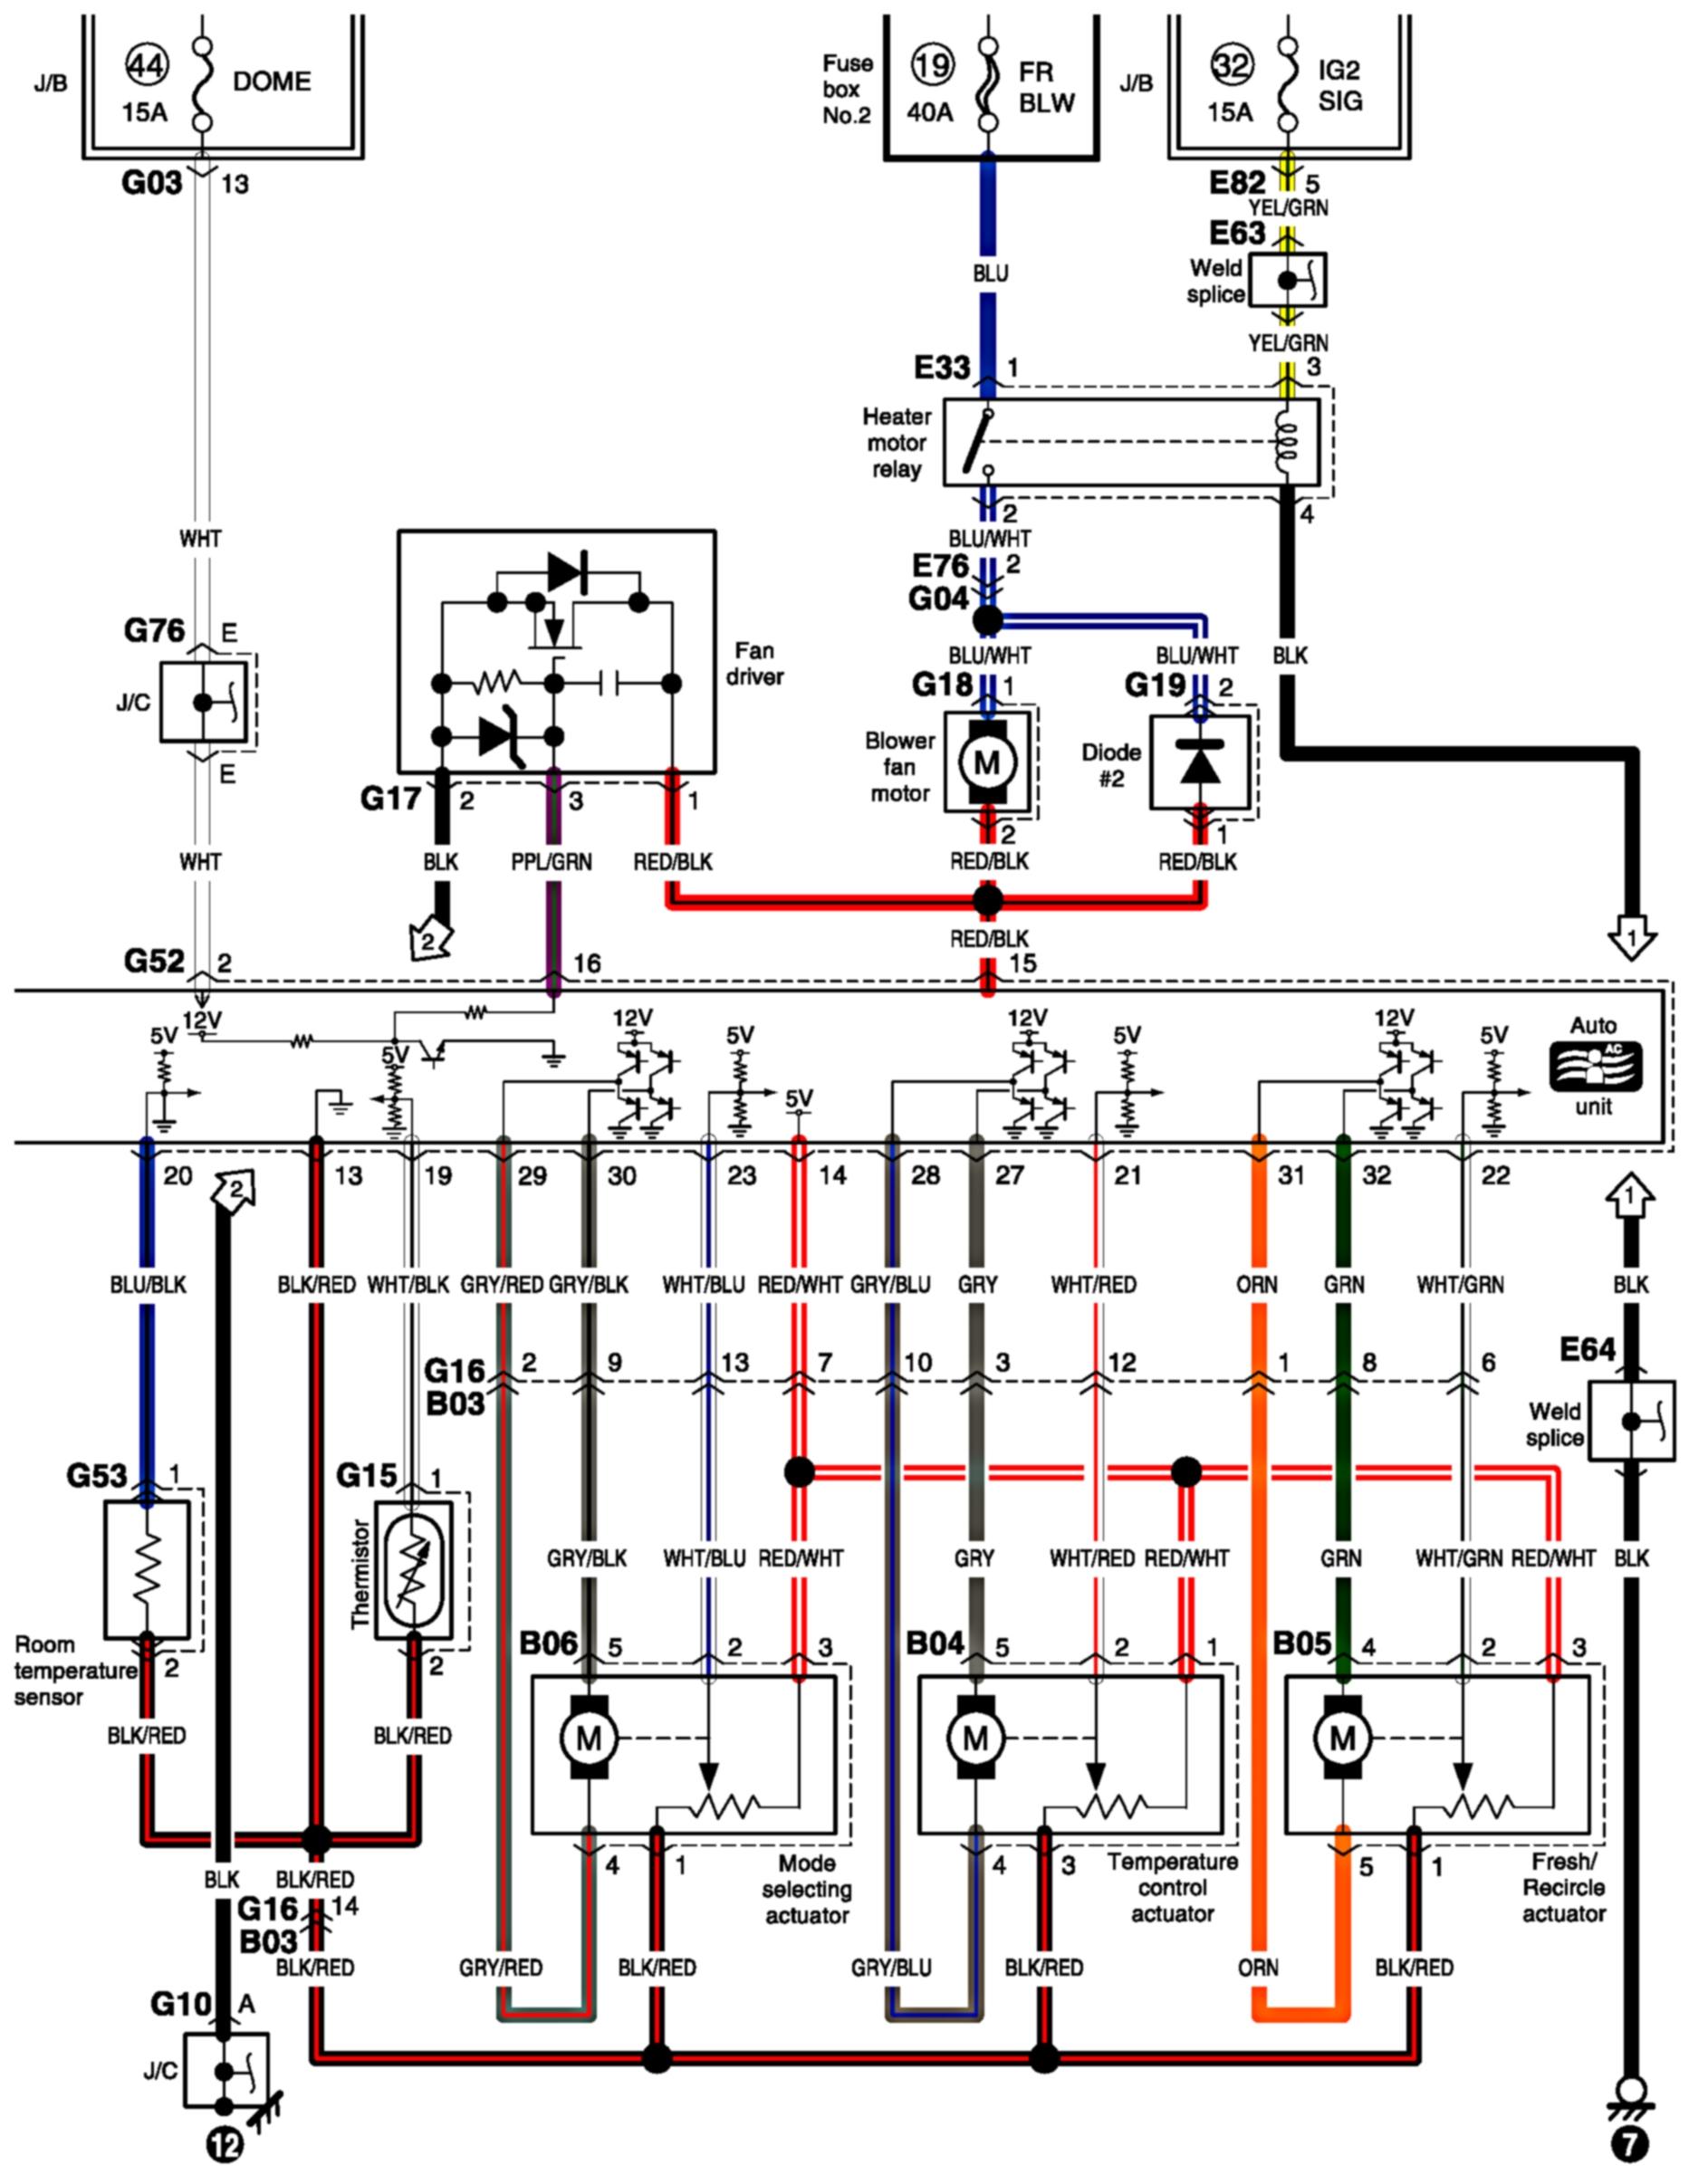 SX_8925] 2006 Suzuki Grand Vitara Wiring Diagram Schematic WiringBupi Habi Alypt Ultr Para Expe Gritea Lectr Erbug Lotap Umng Ally Mepta  Hete Pneu Licuk Chim Xeira Attr Barep Favo Mohammedshrine Librar Wiring 101